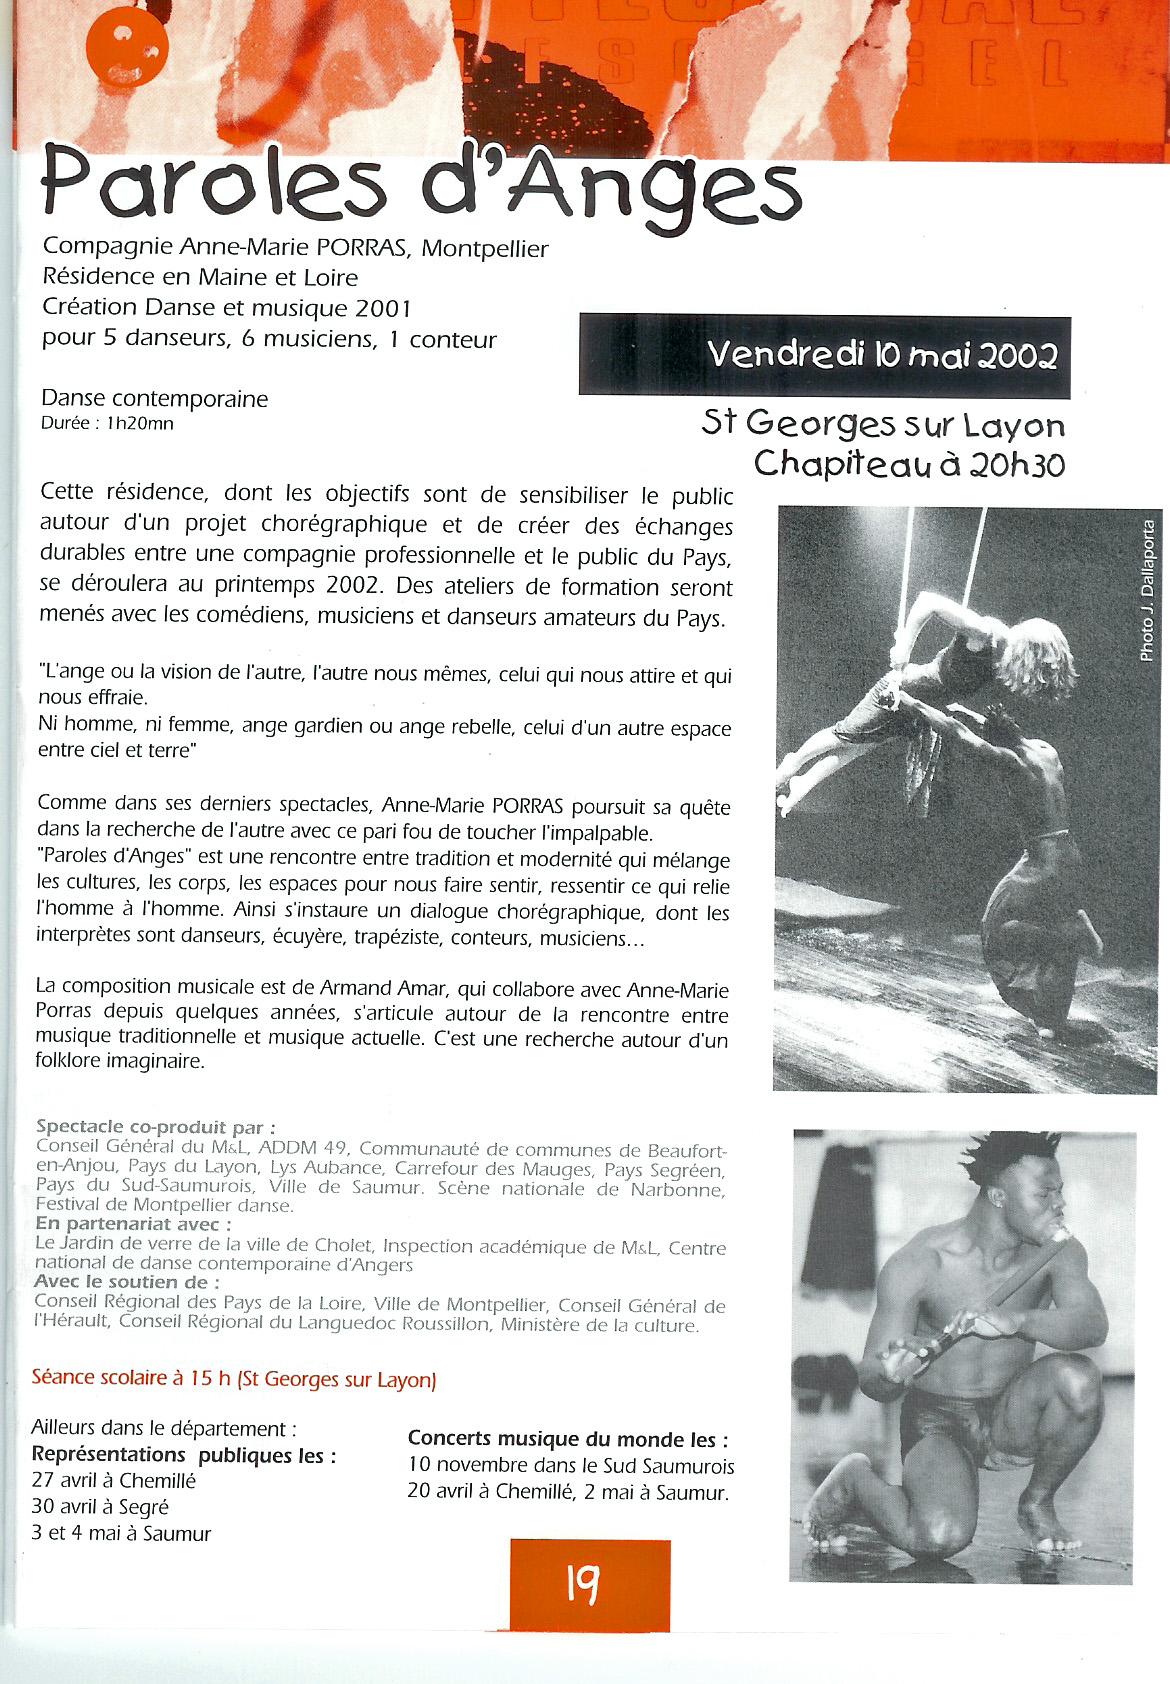 programme vendredi 10 mai 2002